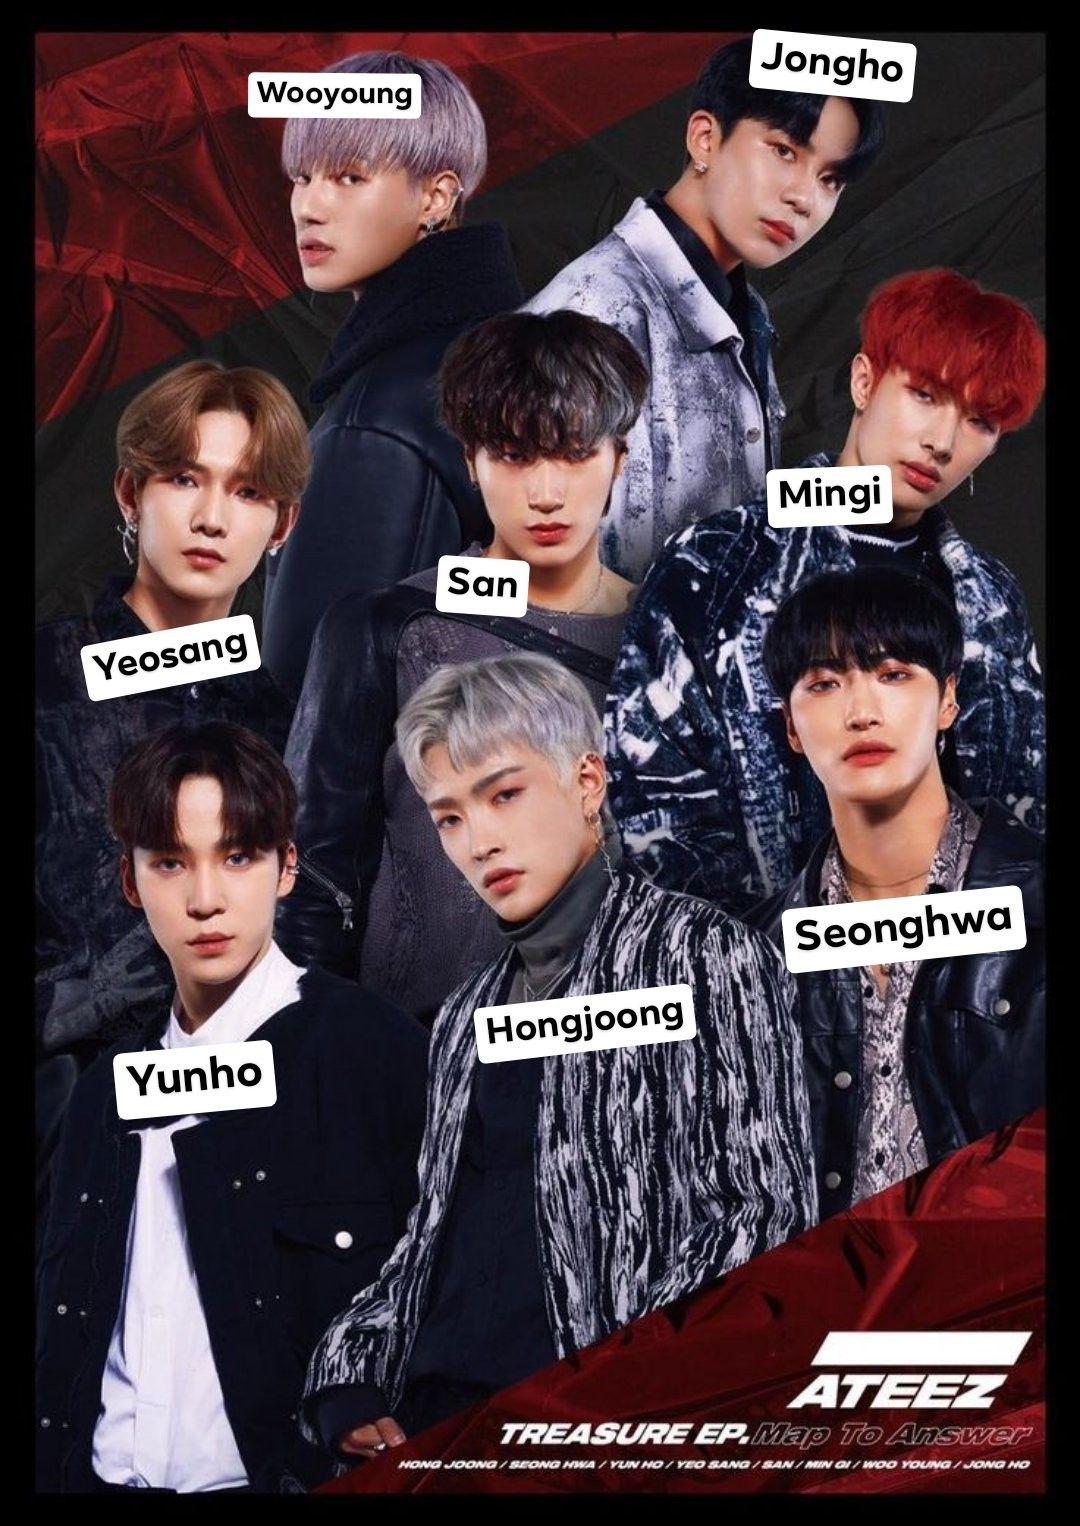 Pin By Vanna On Ateez Kpop Group Names Boy Groups Kpop Wallpaper